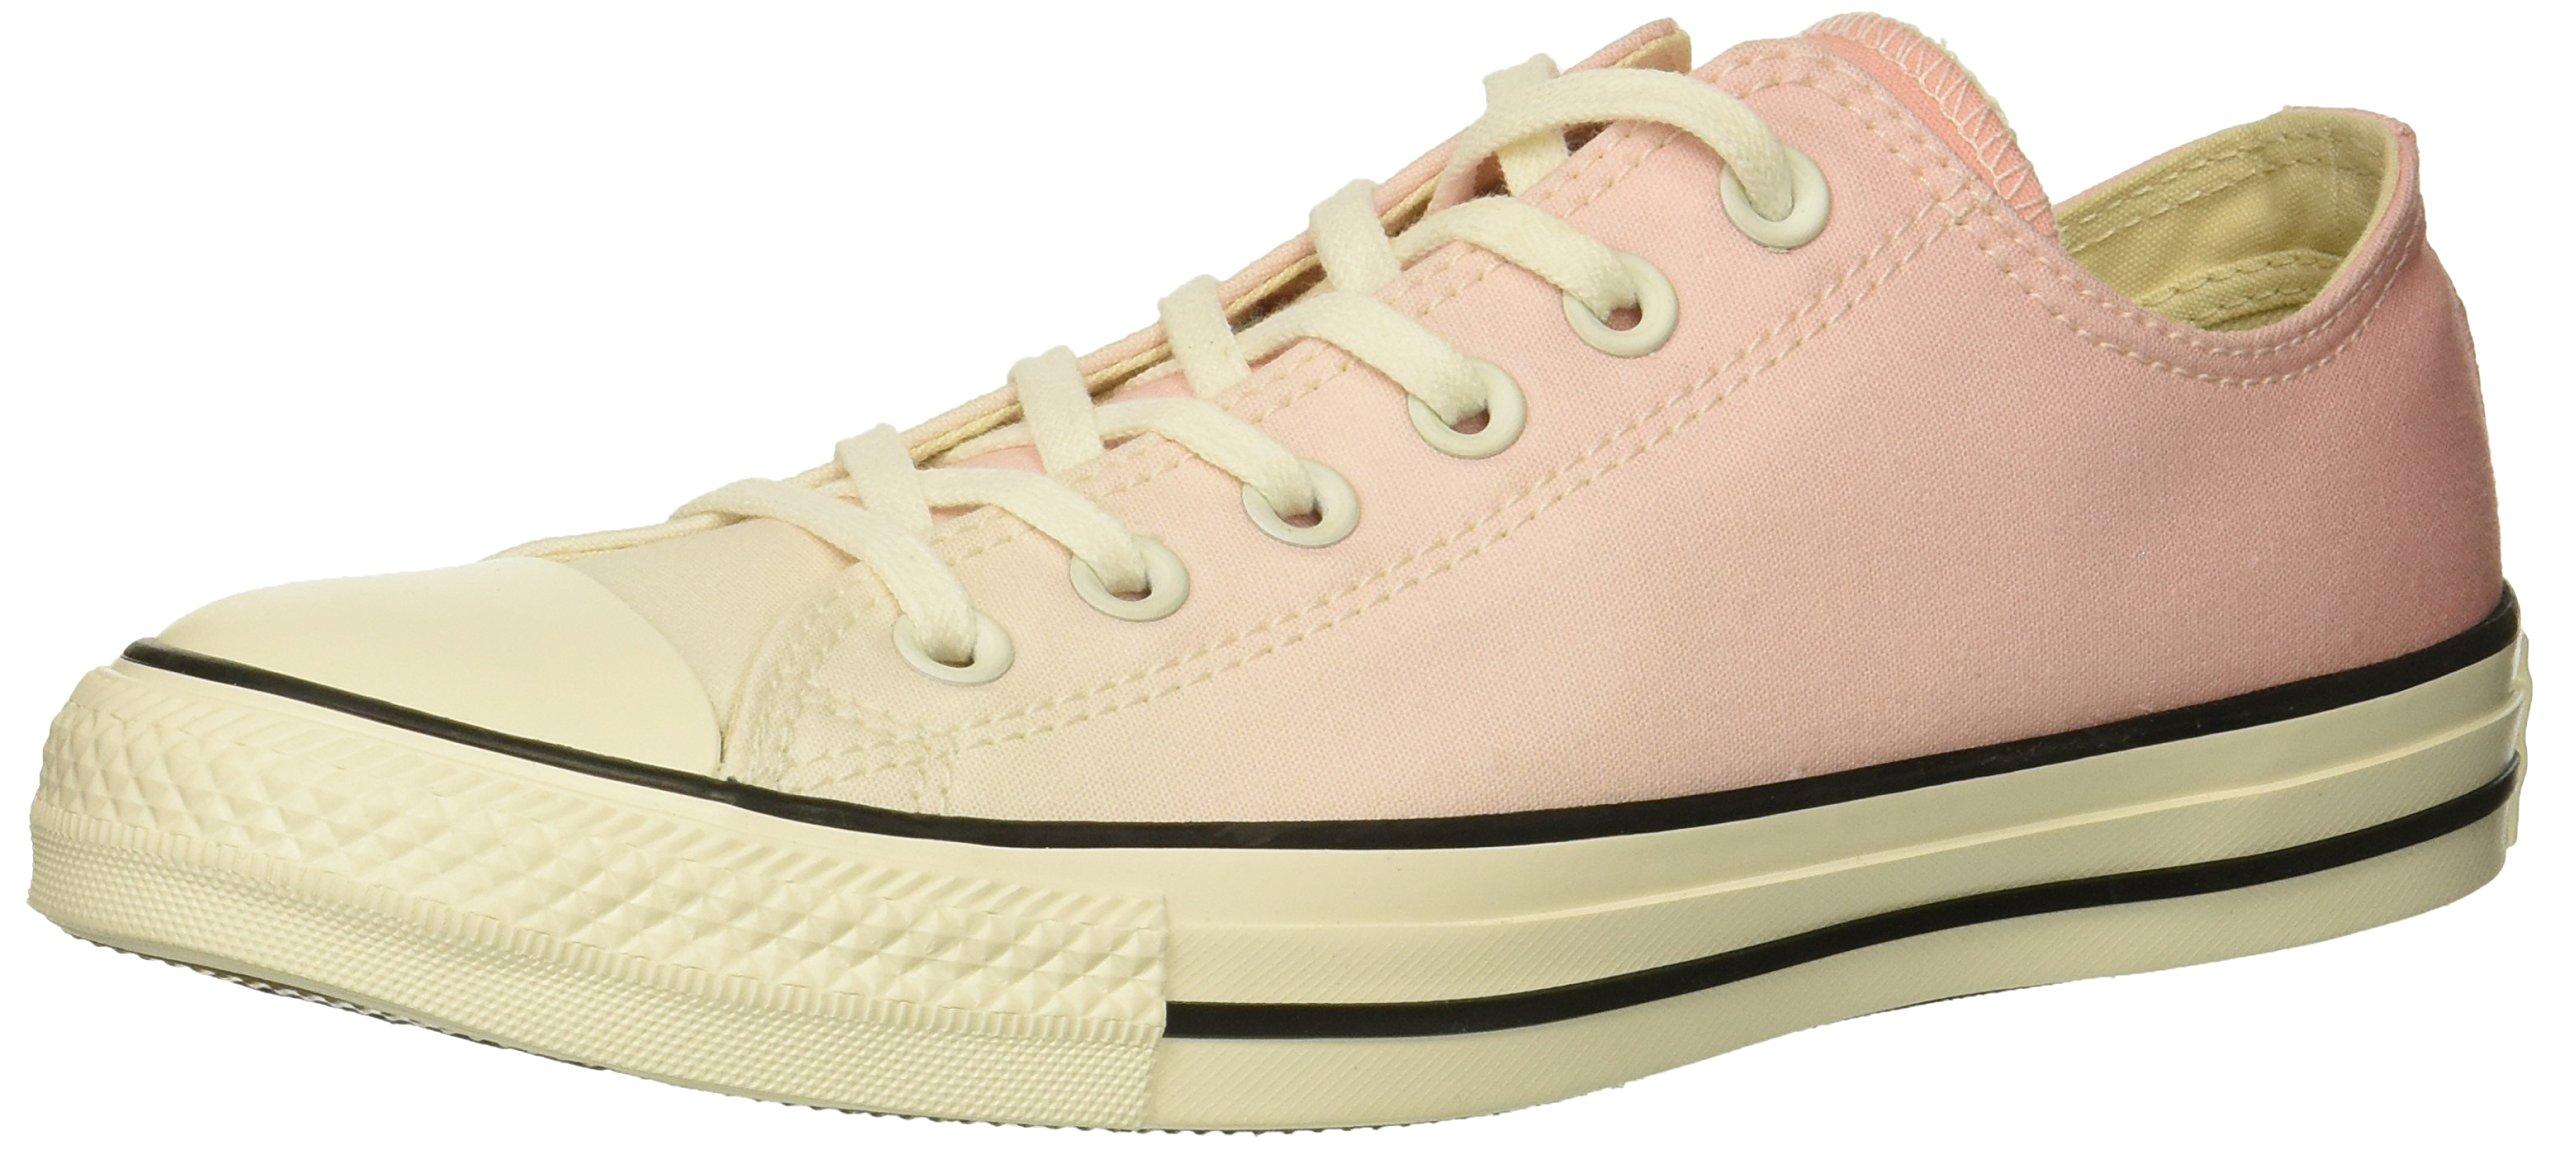 Converse Women's Chuck Taylor All Star Ombre Low Top Sneaker, Storm Pink/Egret/Egret, 8.5 M US